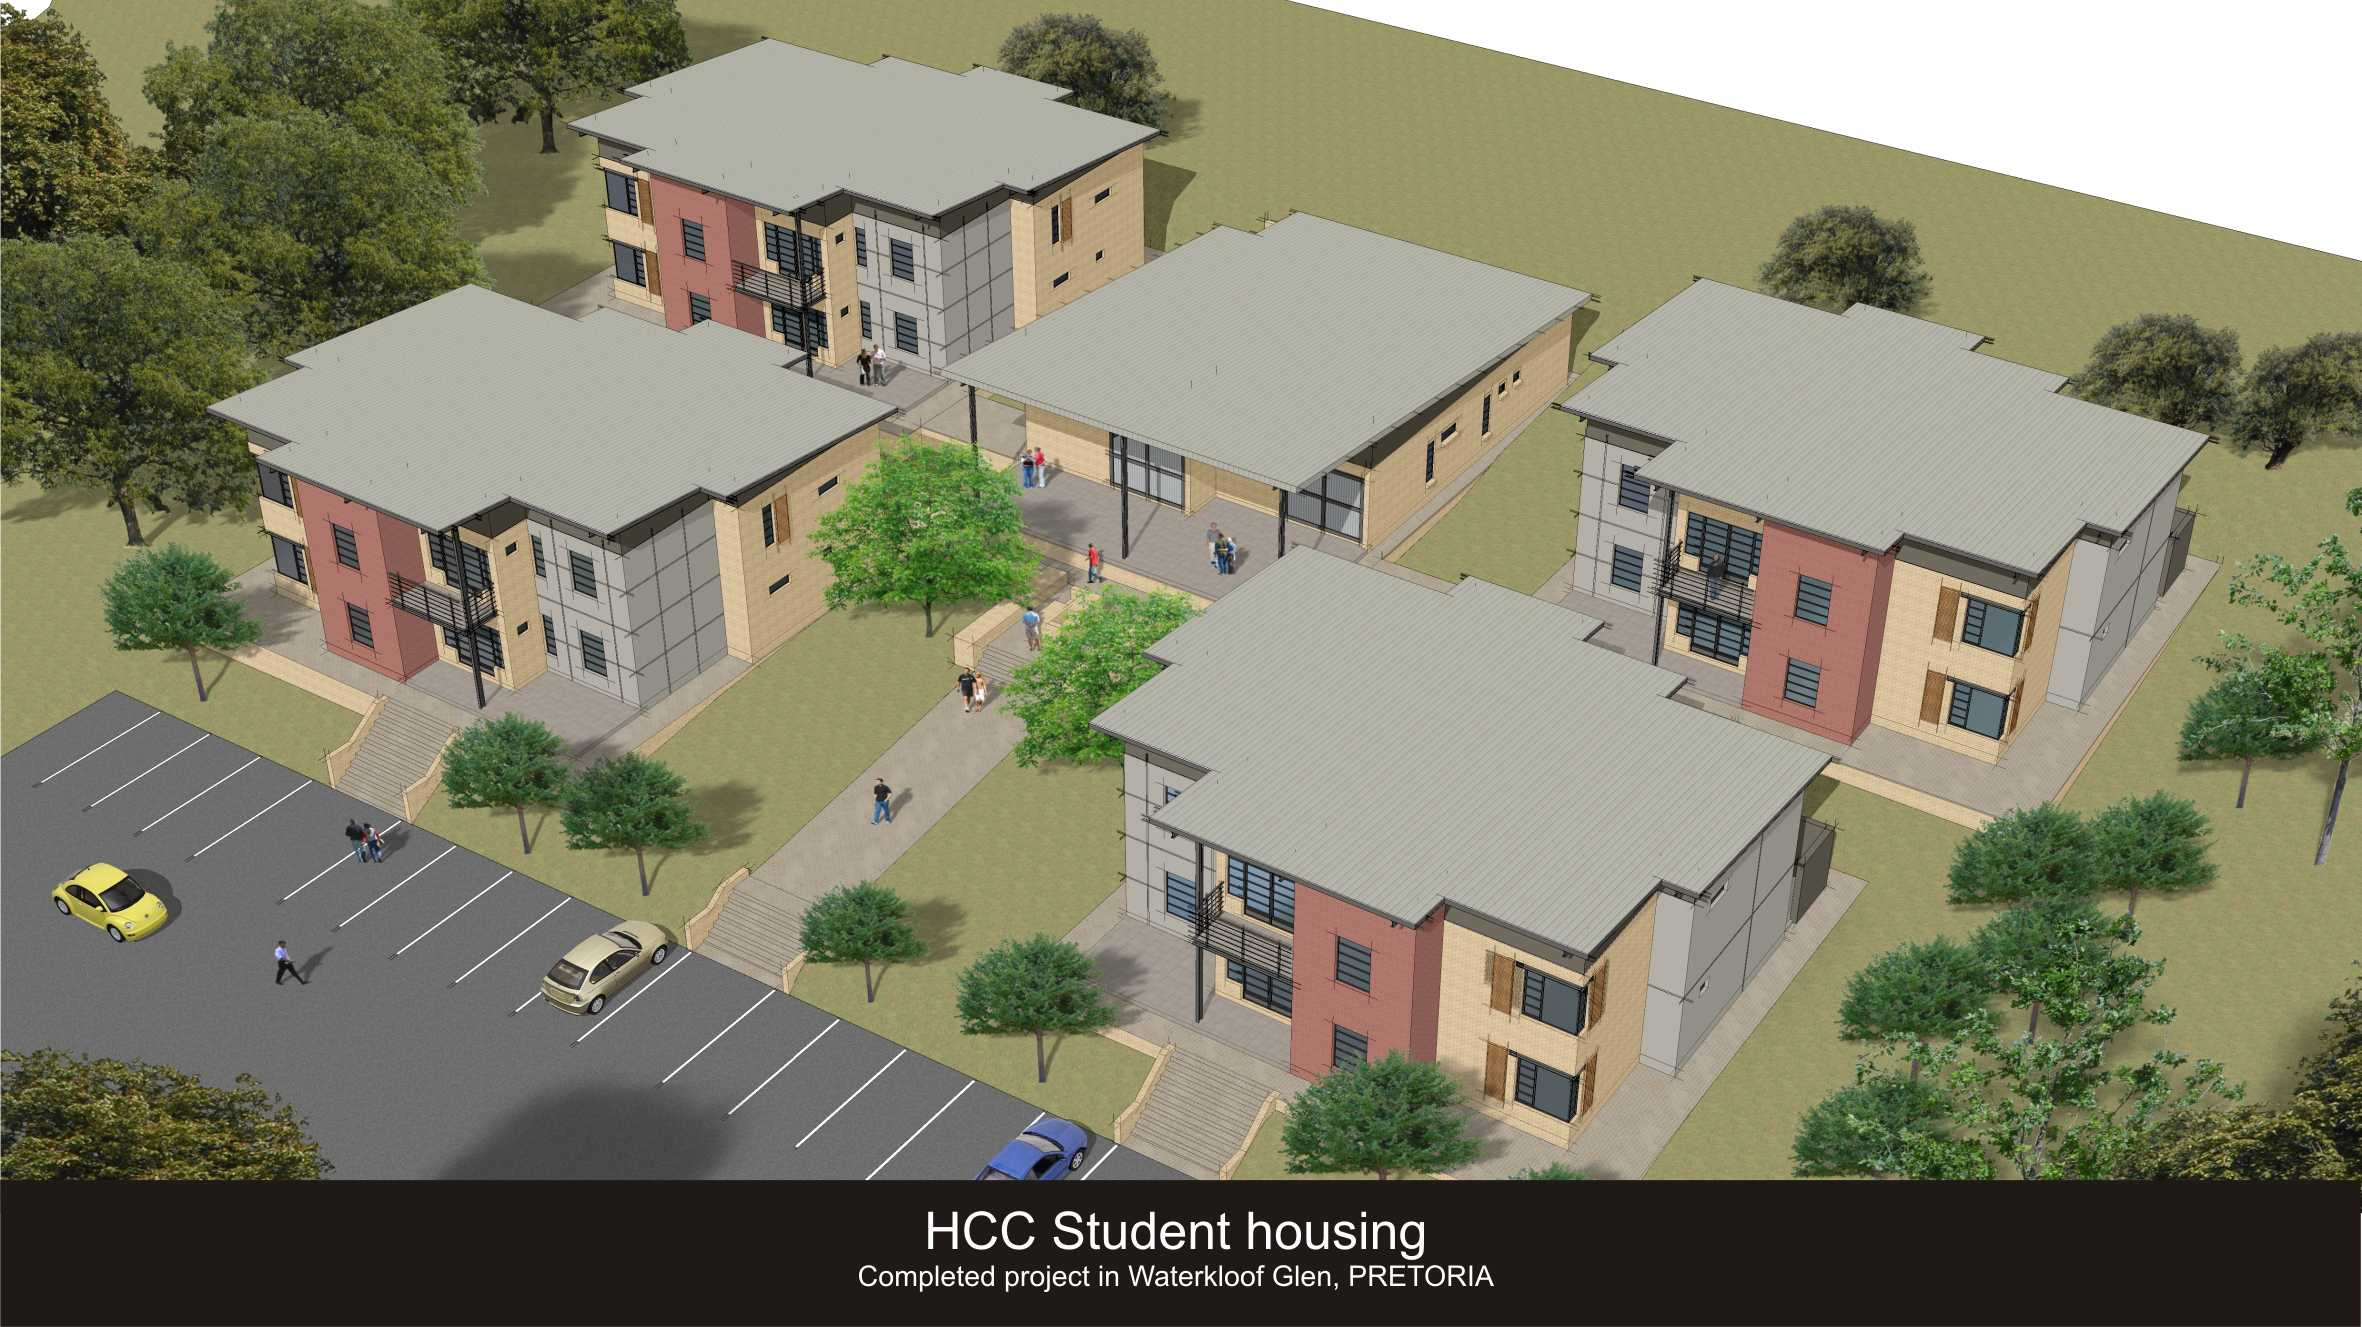 HCC Student Housing 5.JPG